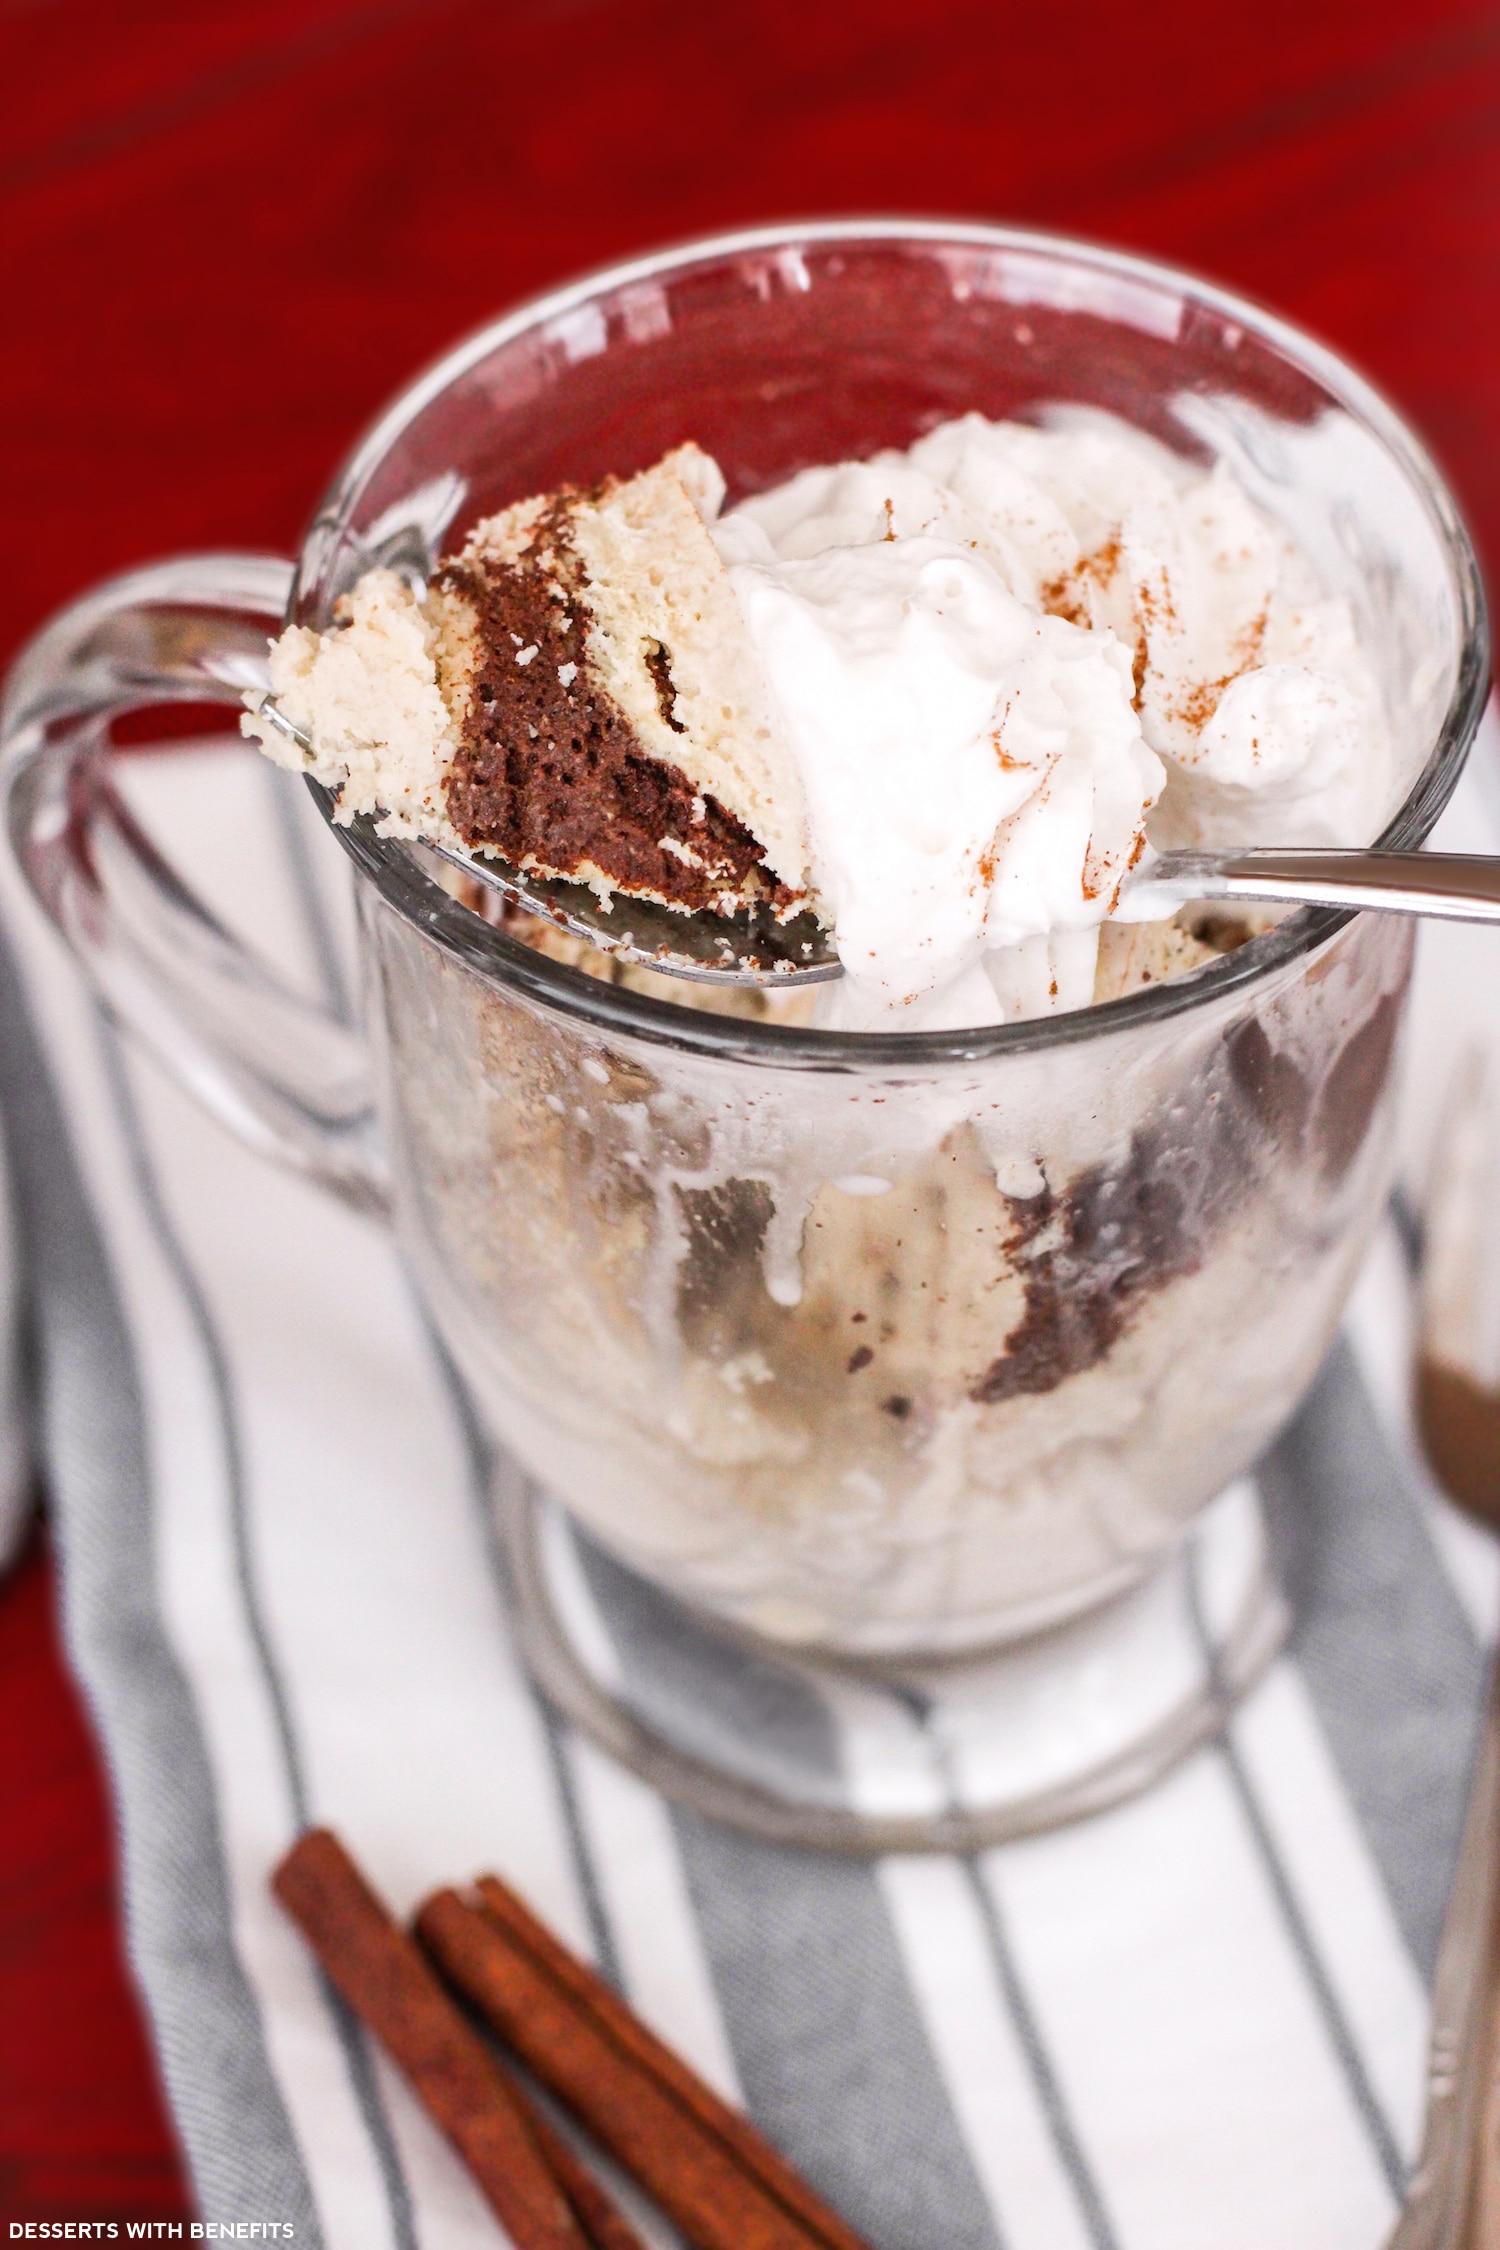 how to serve dessert perogies